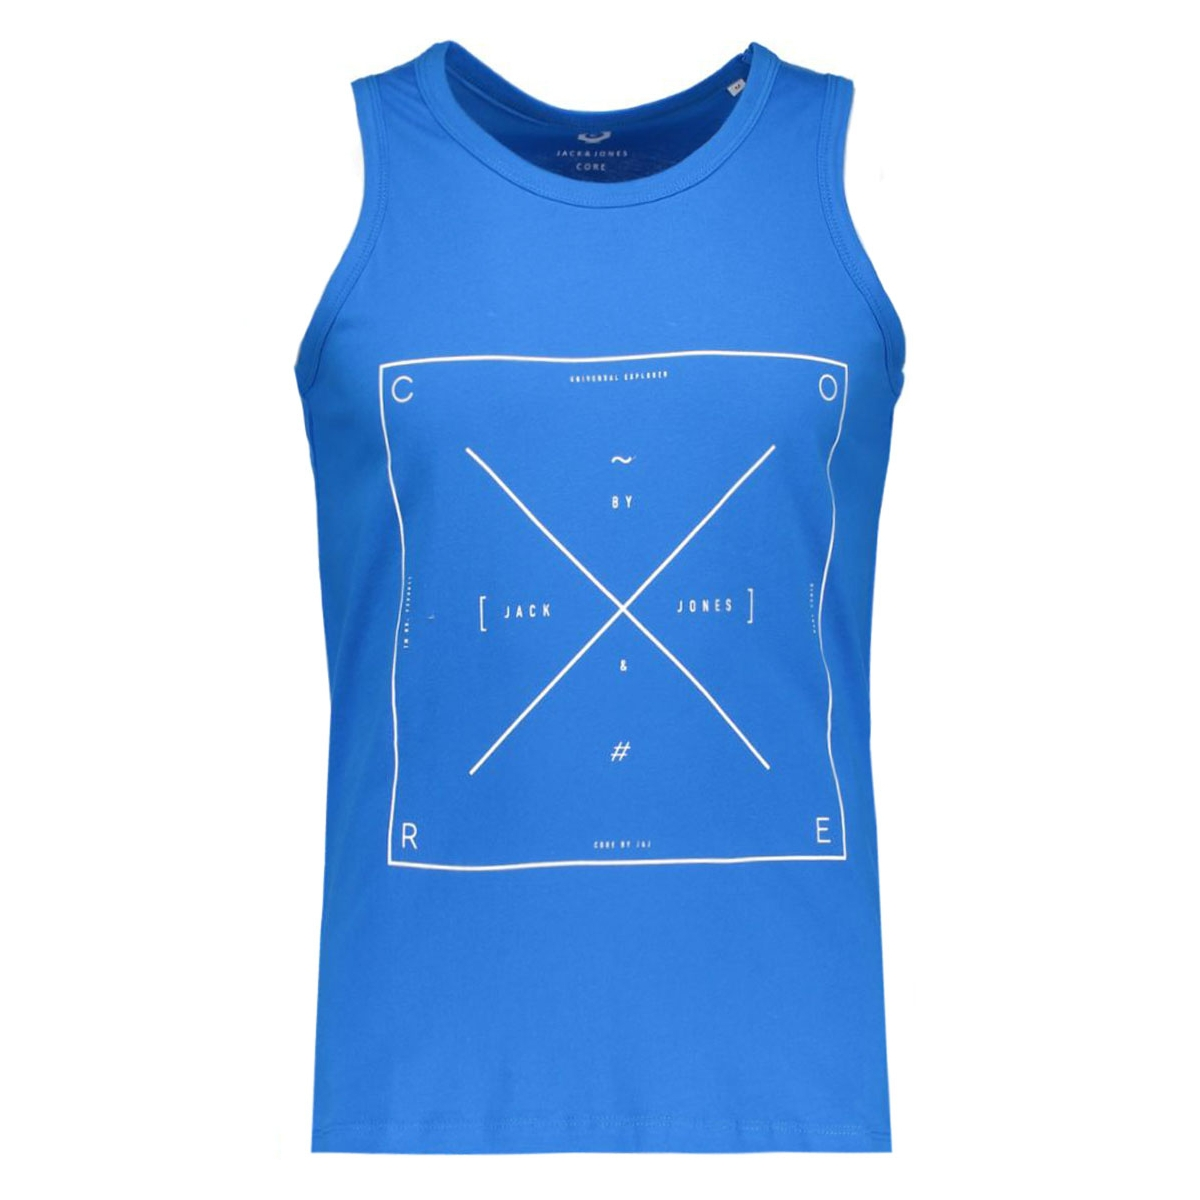 jcoair tee tank top 12107339 jack & jones t-shirt directoire blue/reg tight